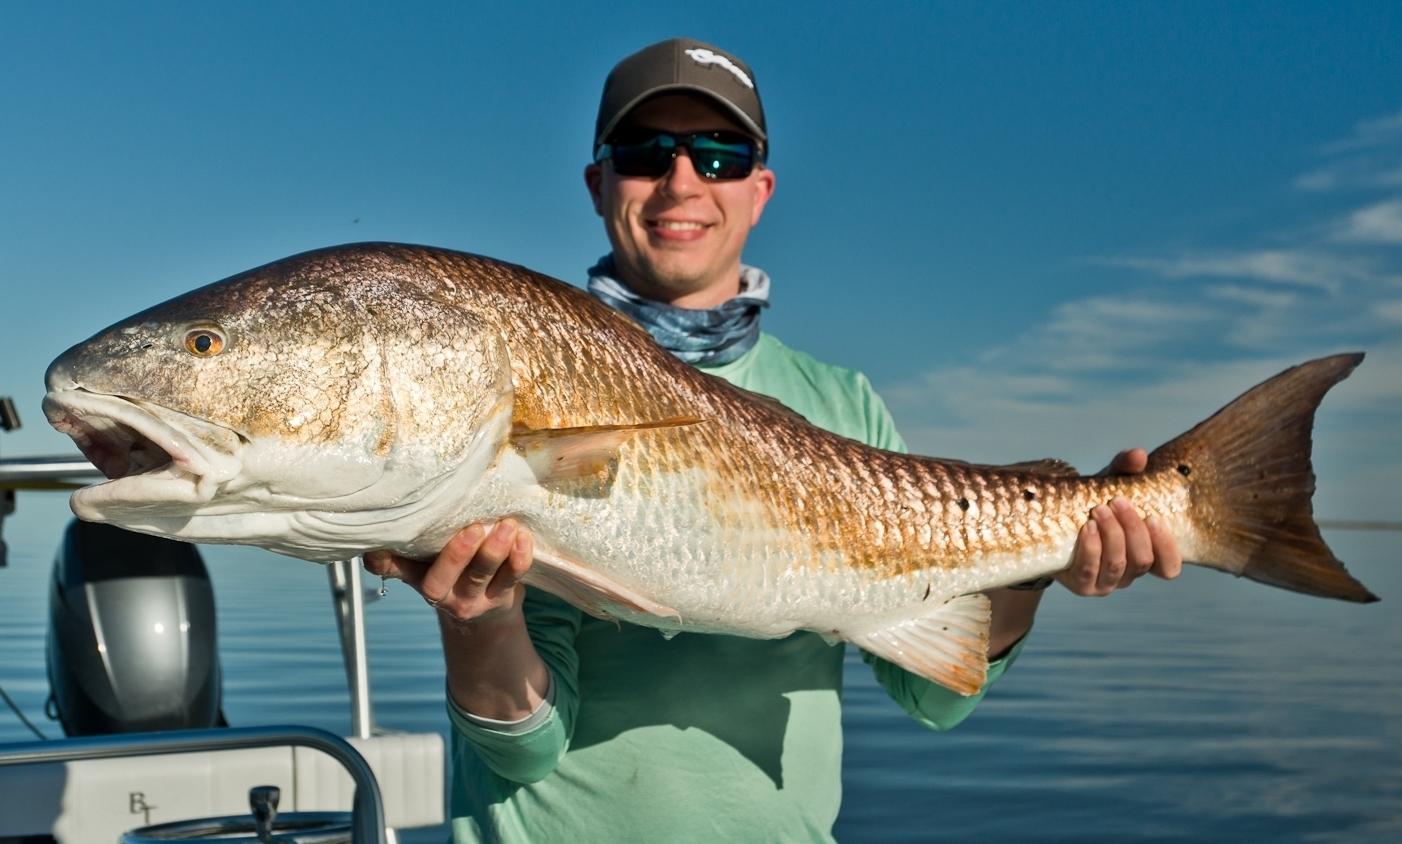 fly-fishing-redfish-new-orleans-louisiana-marsh-2.JPG